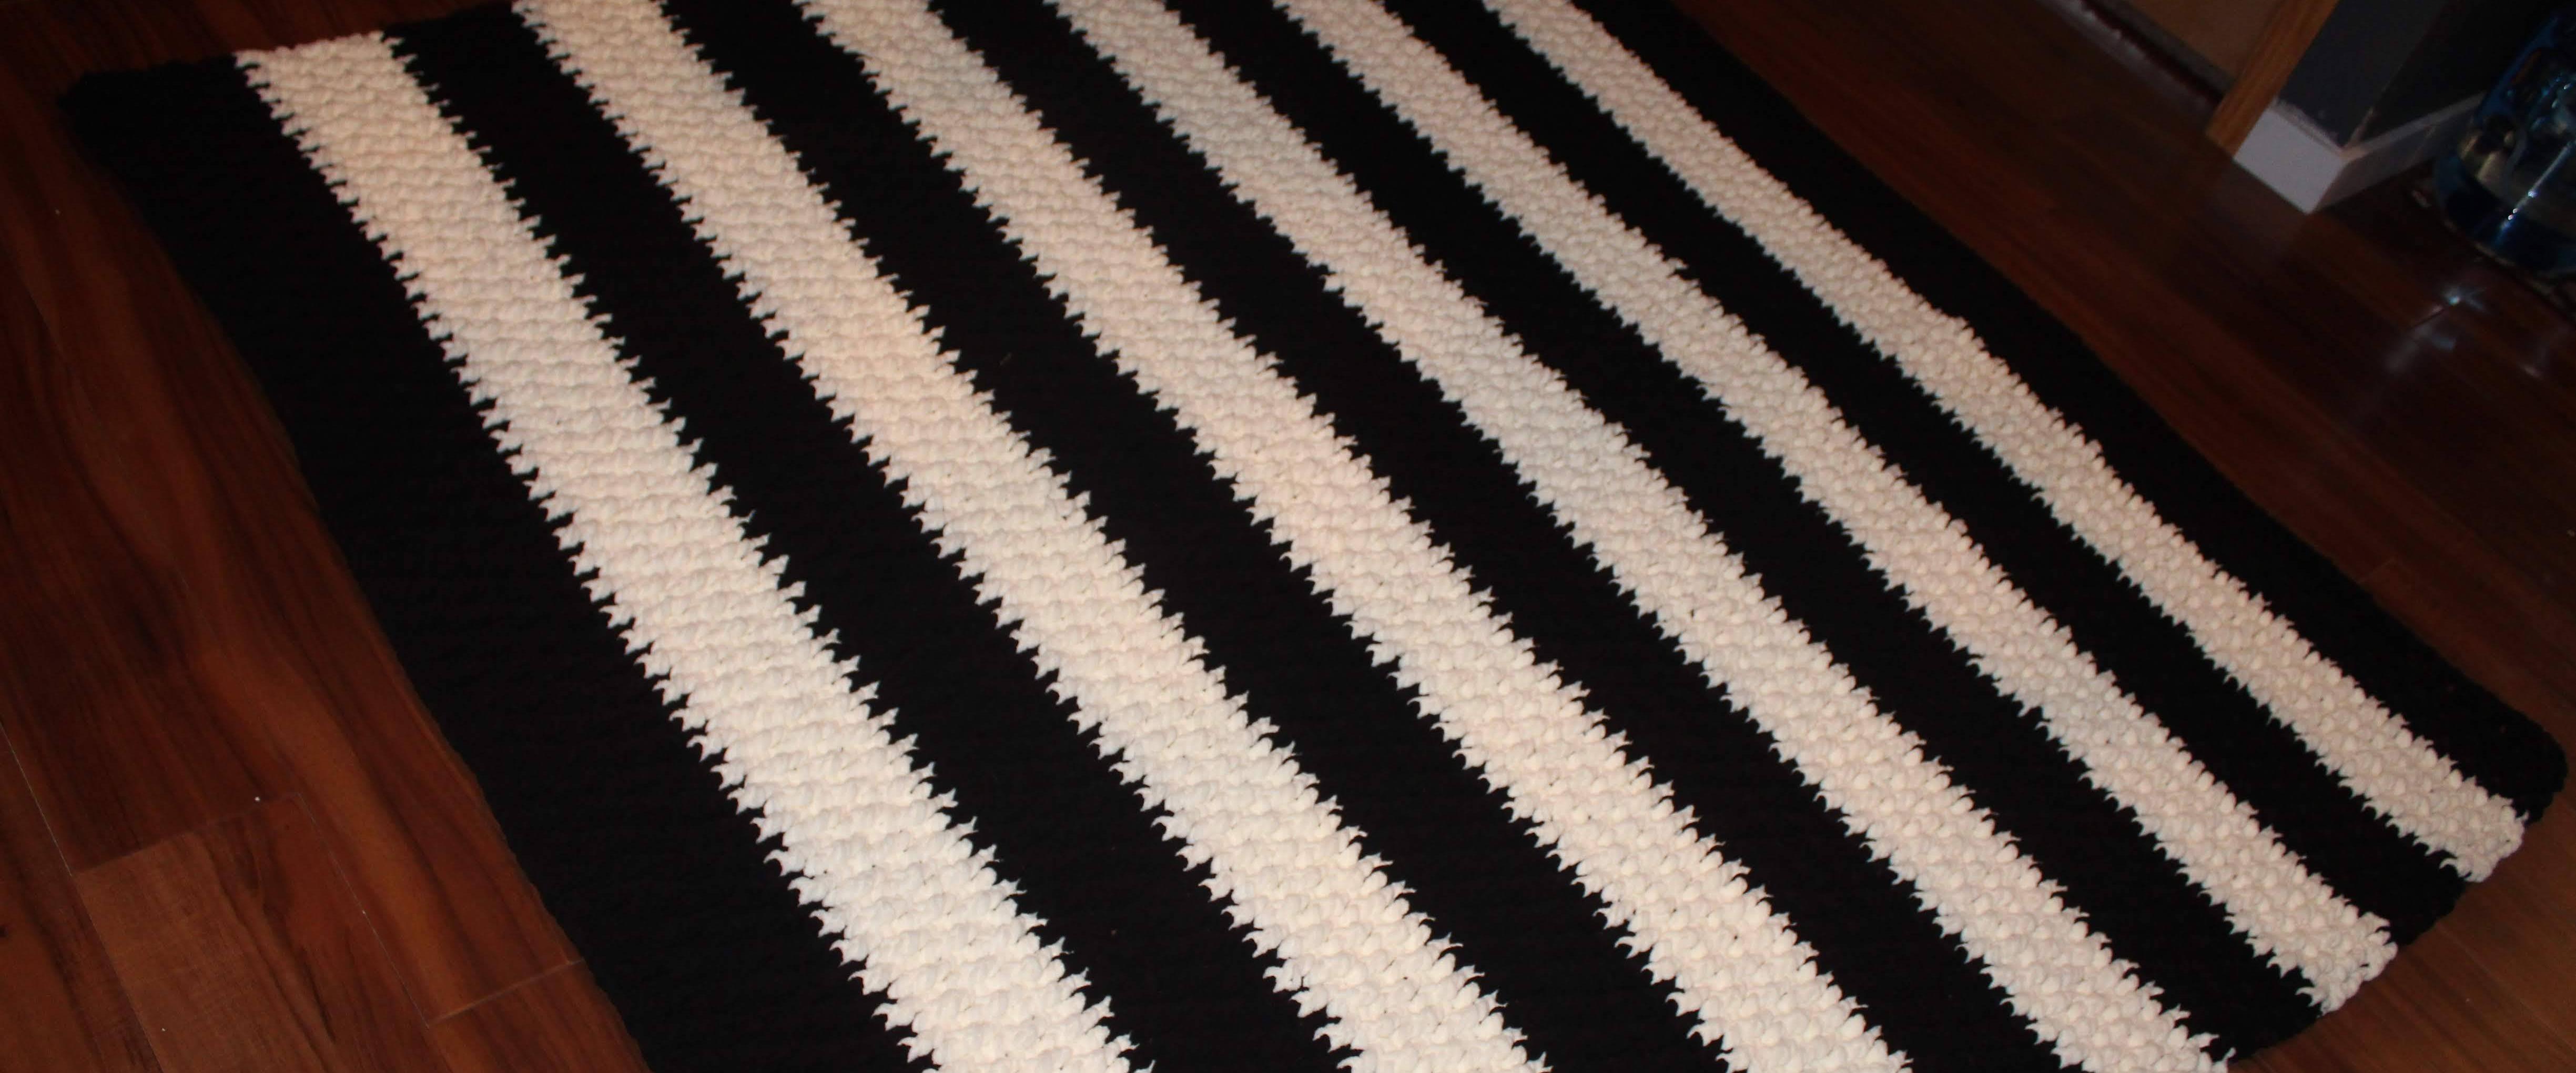 black and white striped blanket